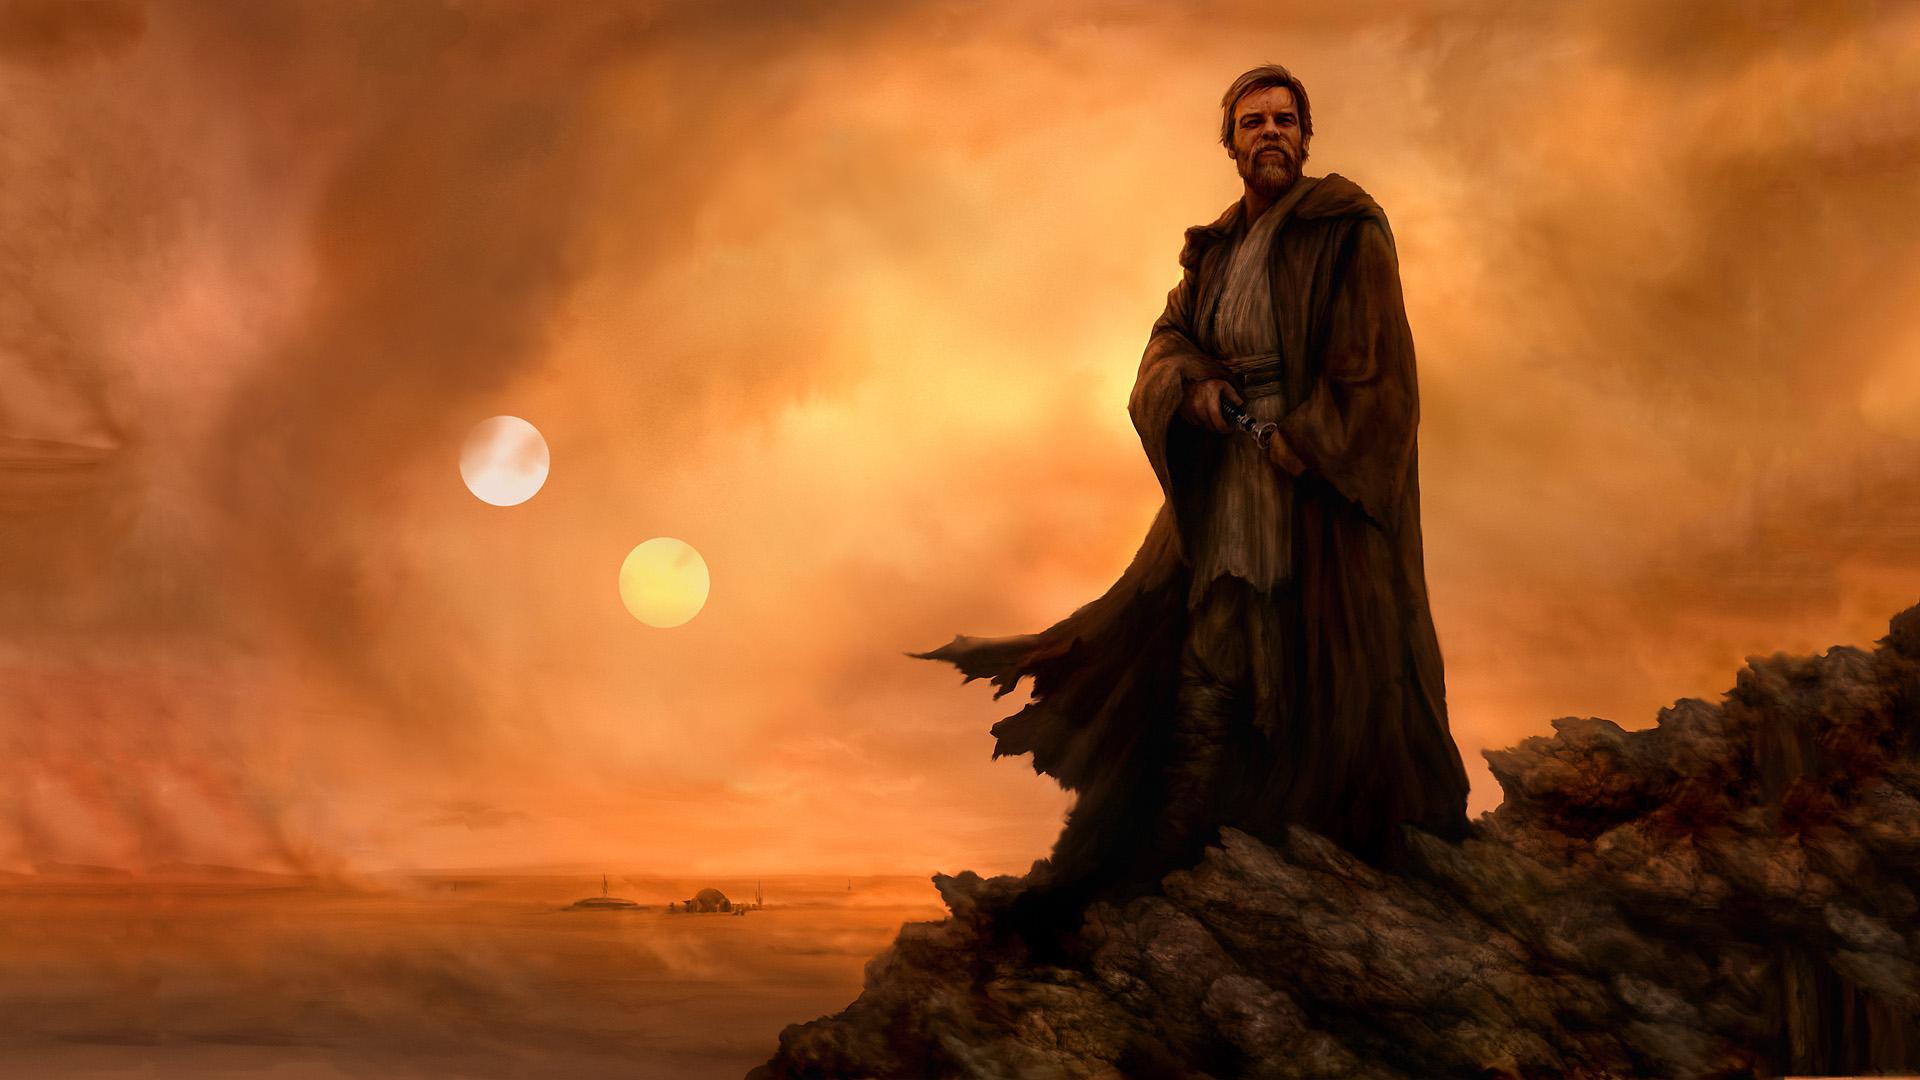 Obi Wan Kenobi Wallpaper 3 1920x1080